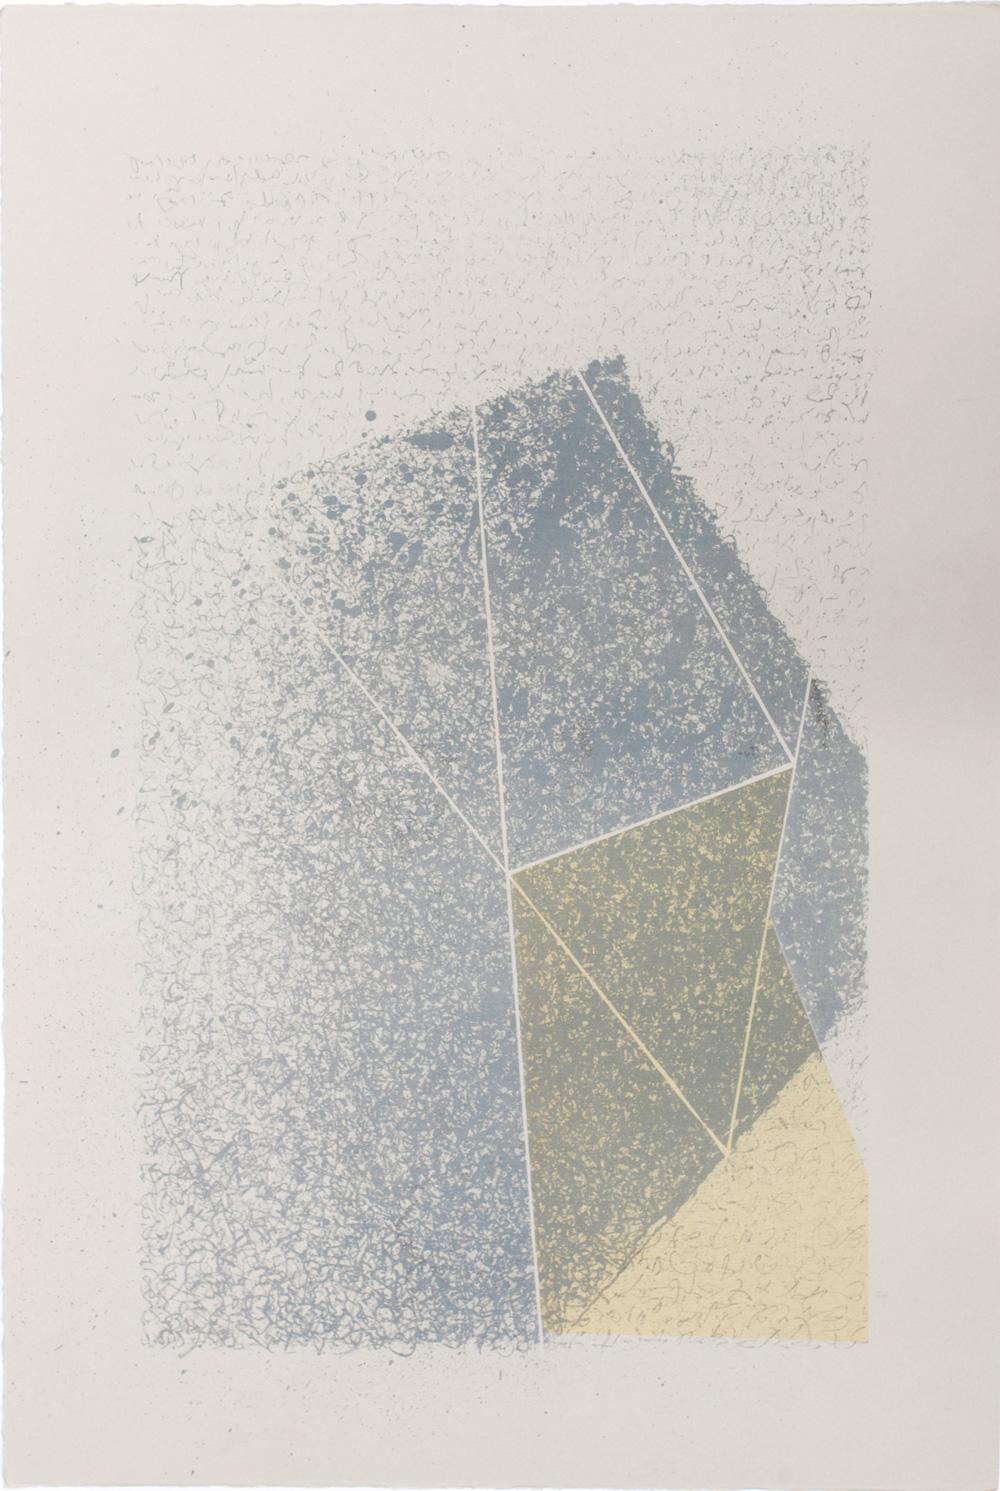 Albuquerque Colour Square 2015, Lithograph, 50 x 35cm